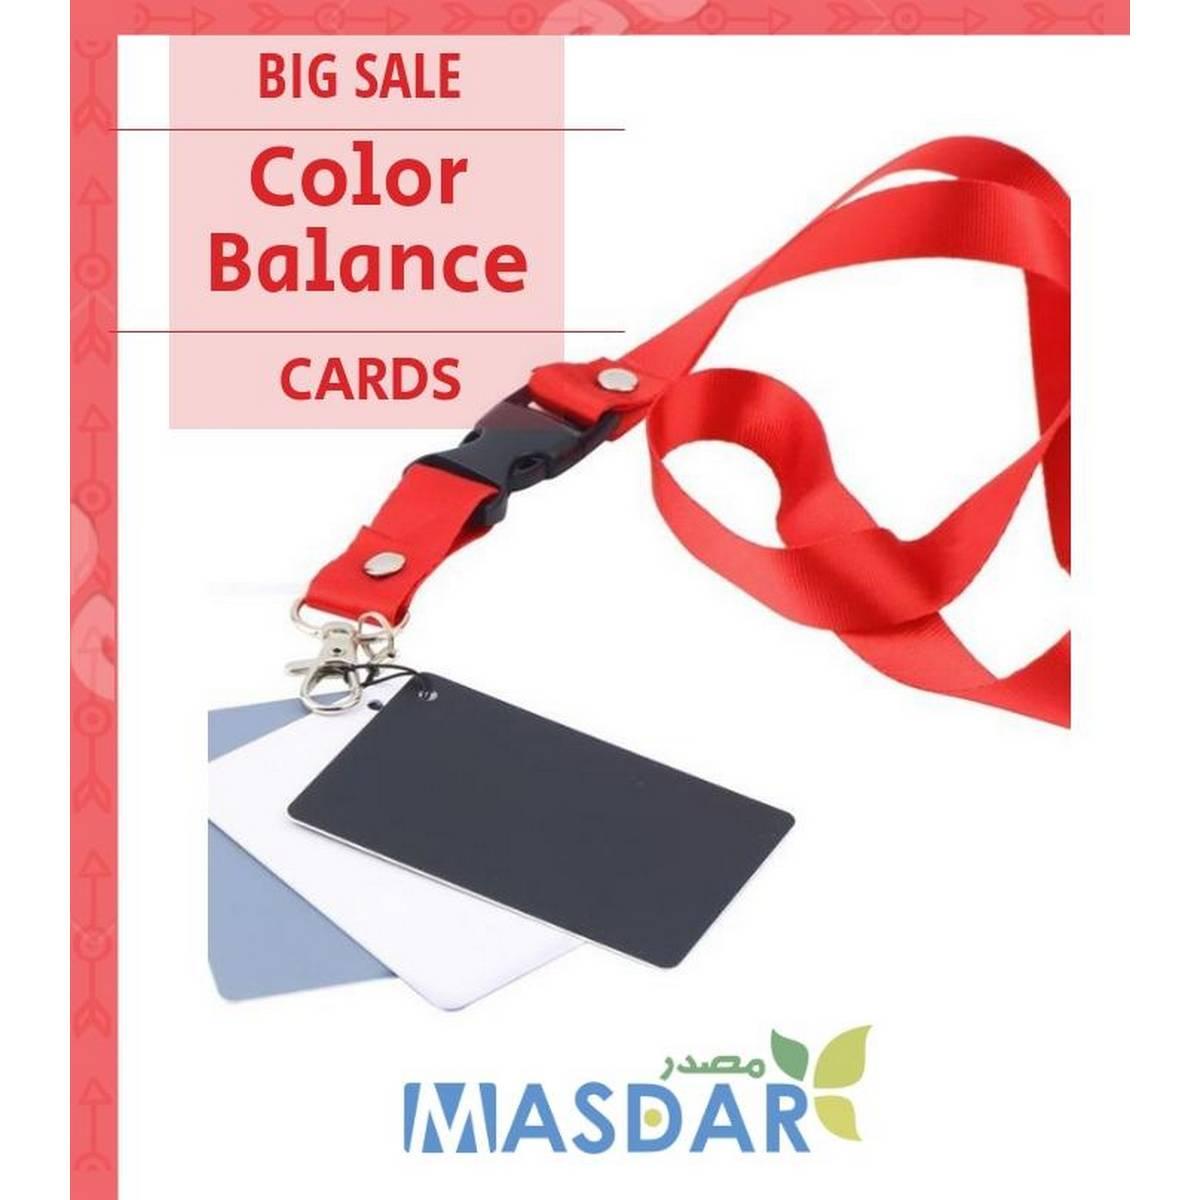 Digital Camera 3 in 1 Pocket-Size White Black Grey Balance Cards - Multicolor